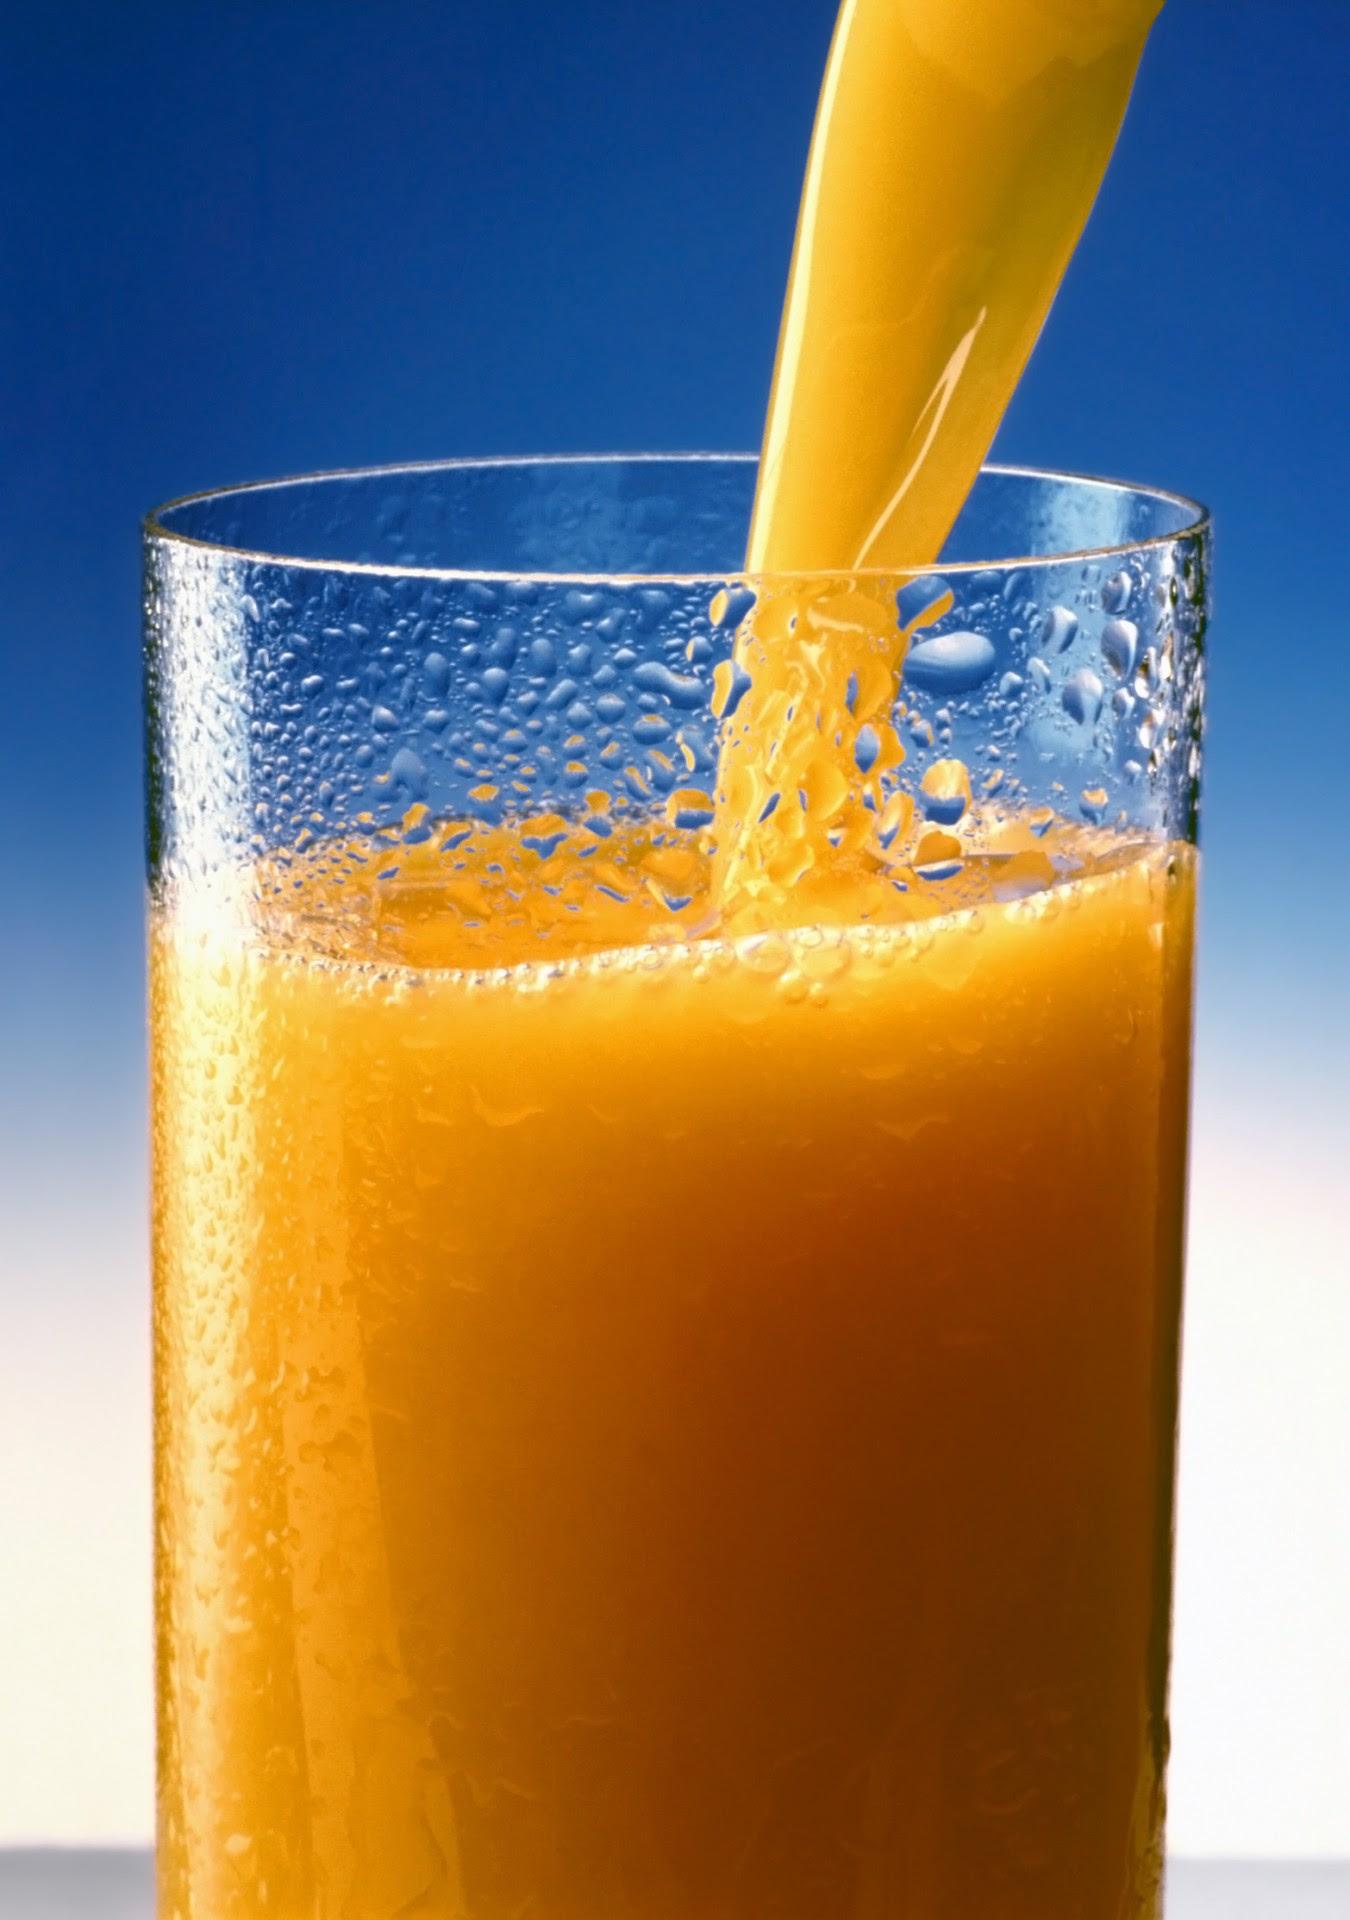 makanan sihat yang menggemukkan - jus